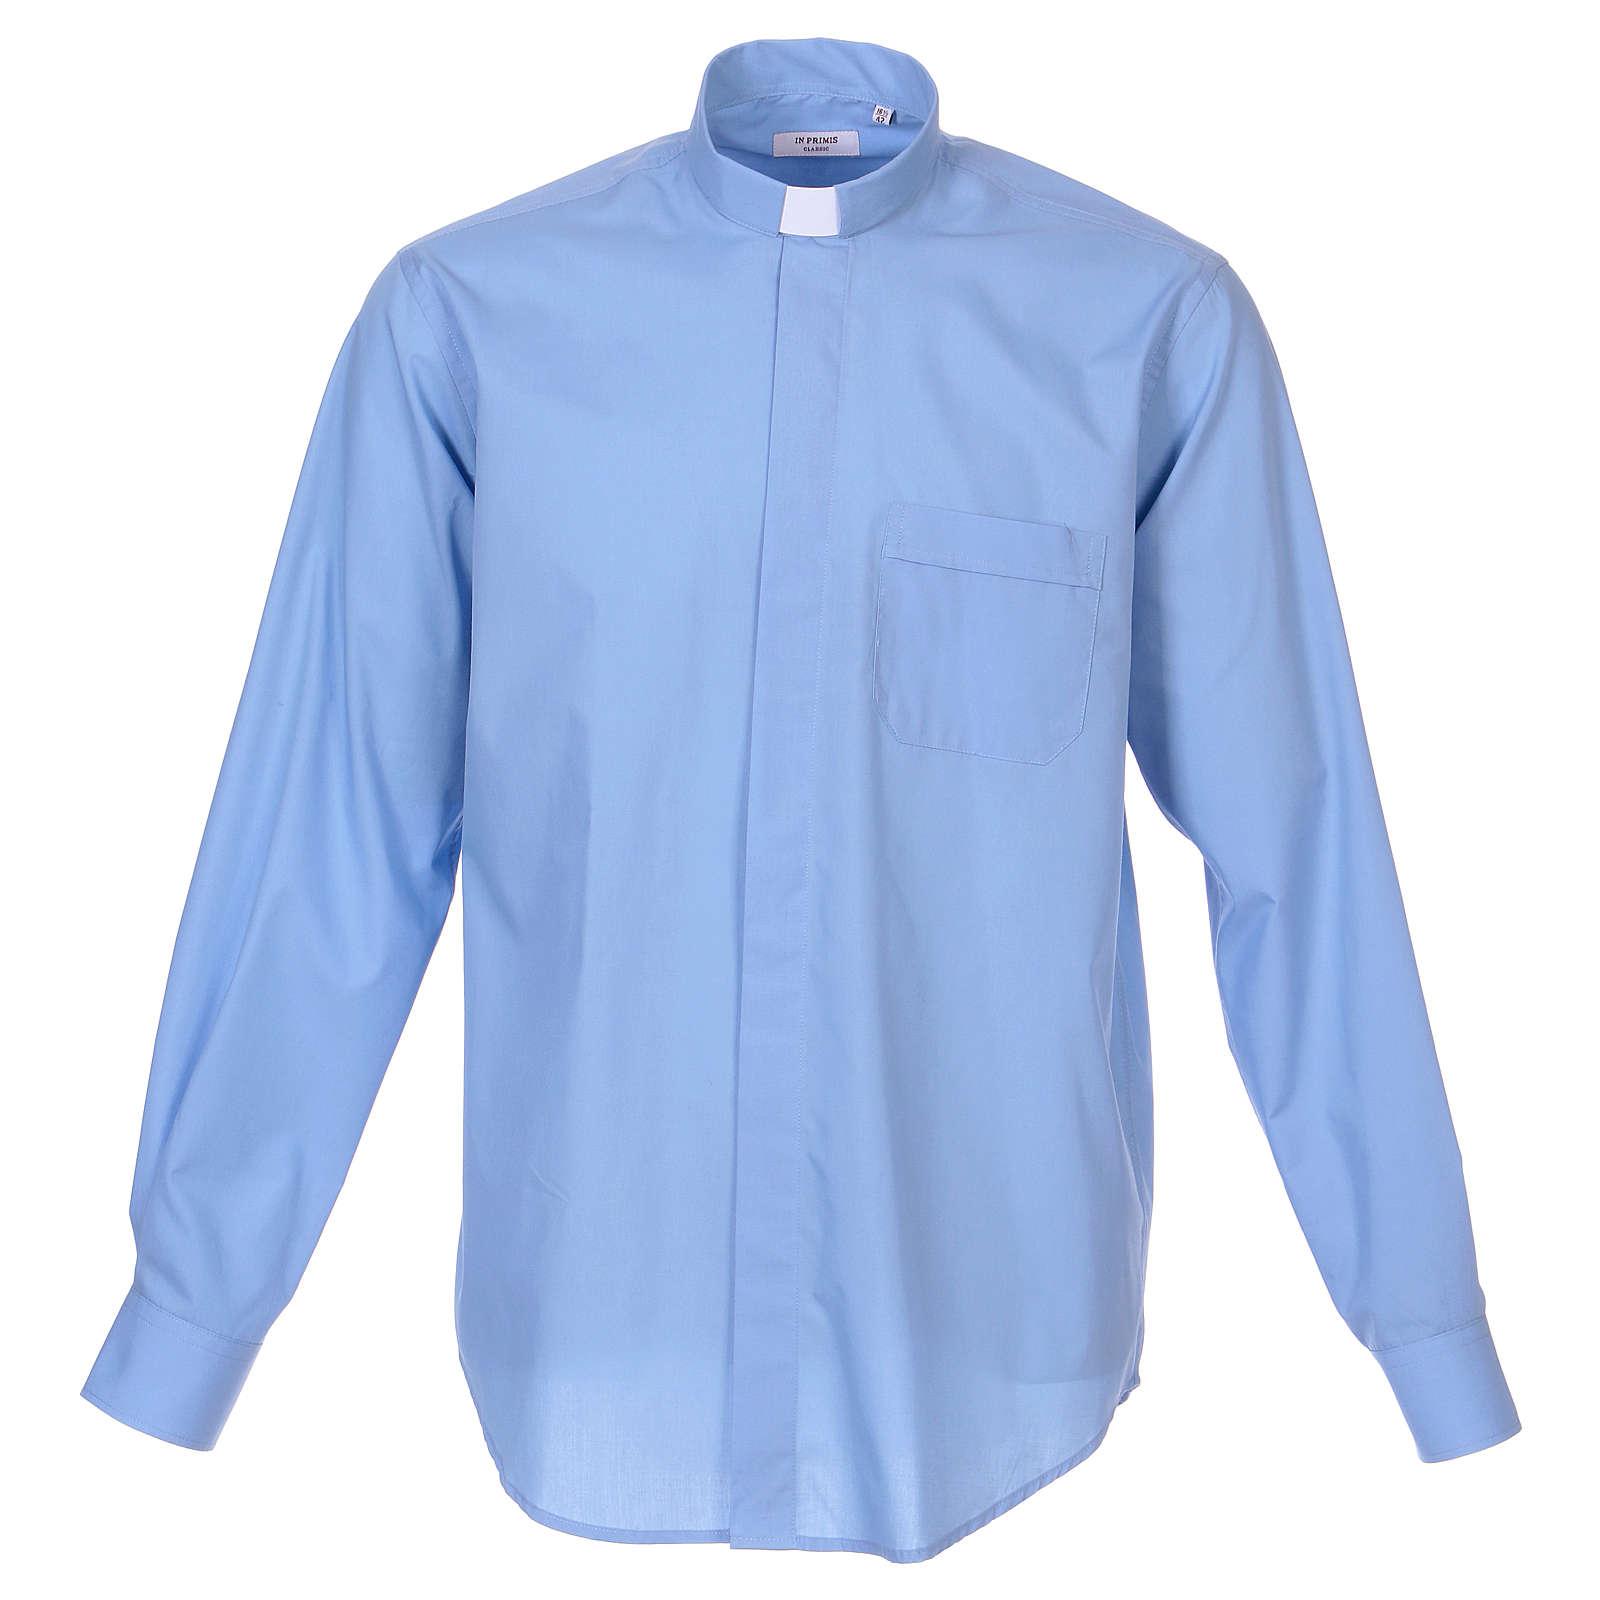 Camicia Clergy manica lunga misto cotone celeste In Primis 4